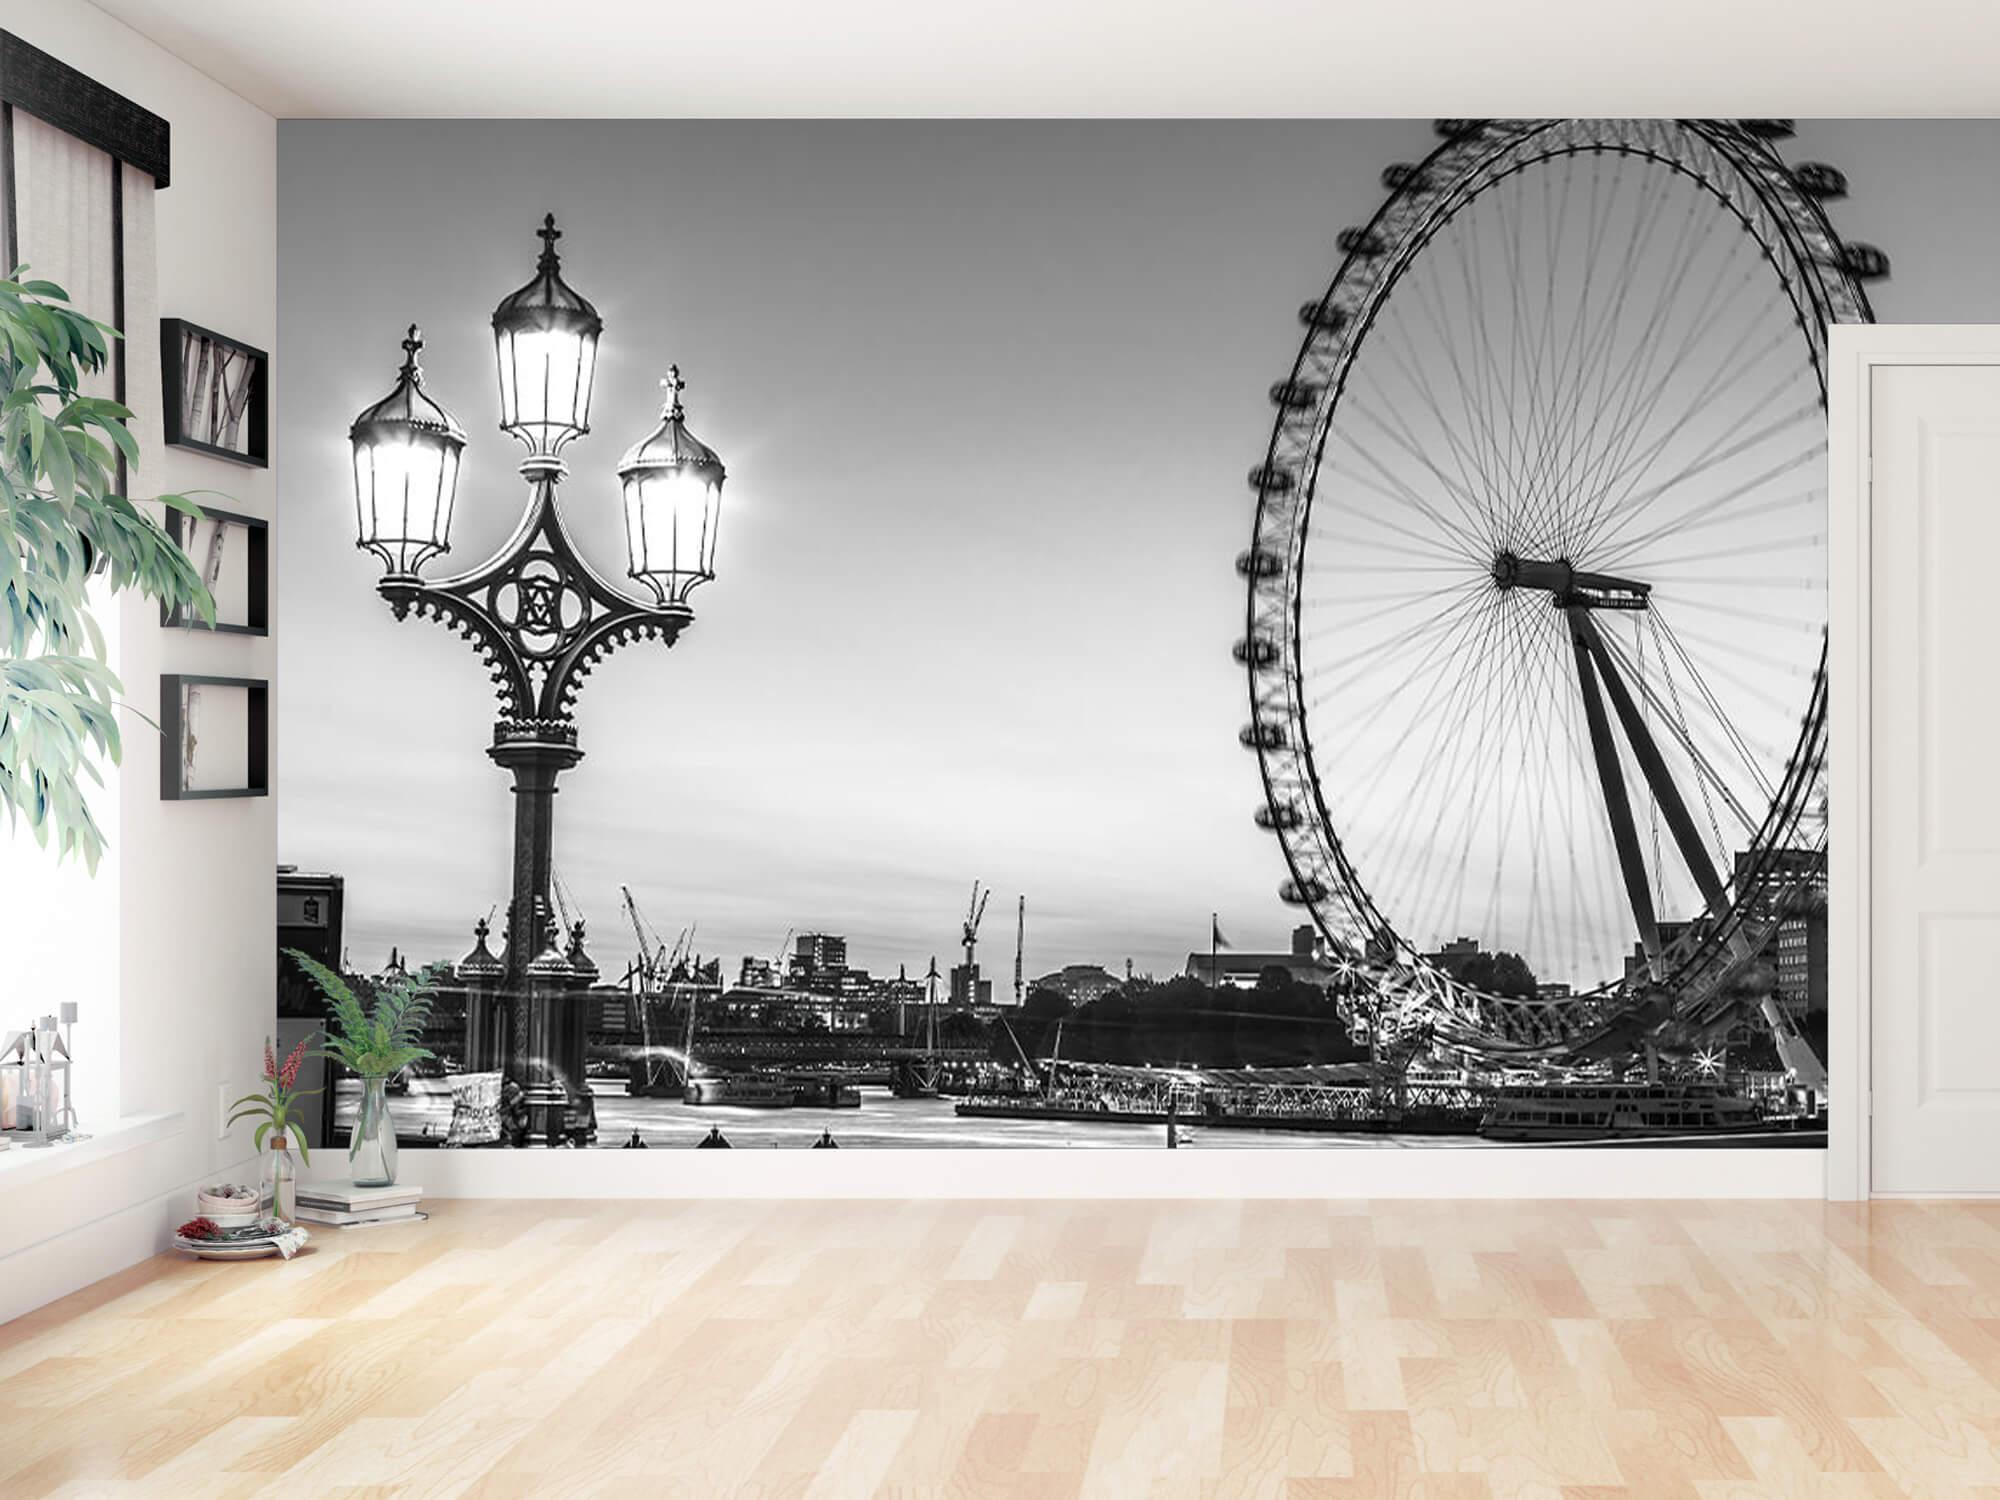 Ferris wheel black and white 1